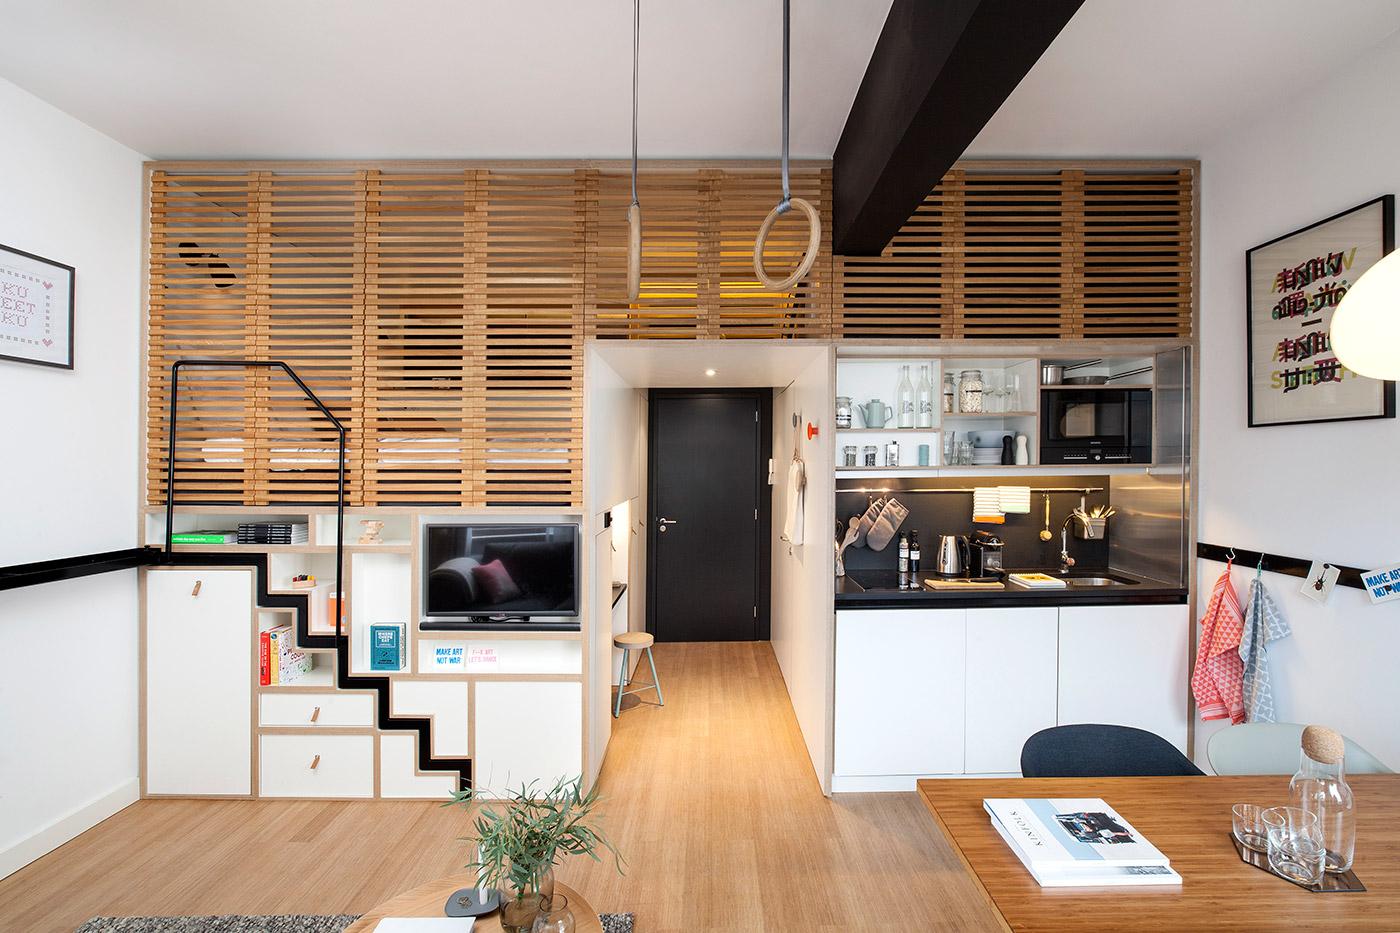 small house design with mezzanine gallery of la concha modern trendy mezzanine stairs ideas viskas apie interjer with small house design with mezzanine